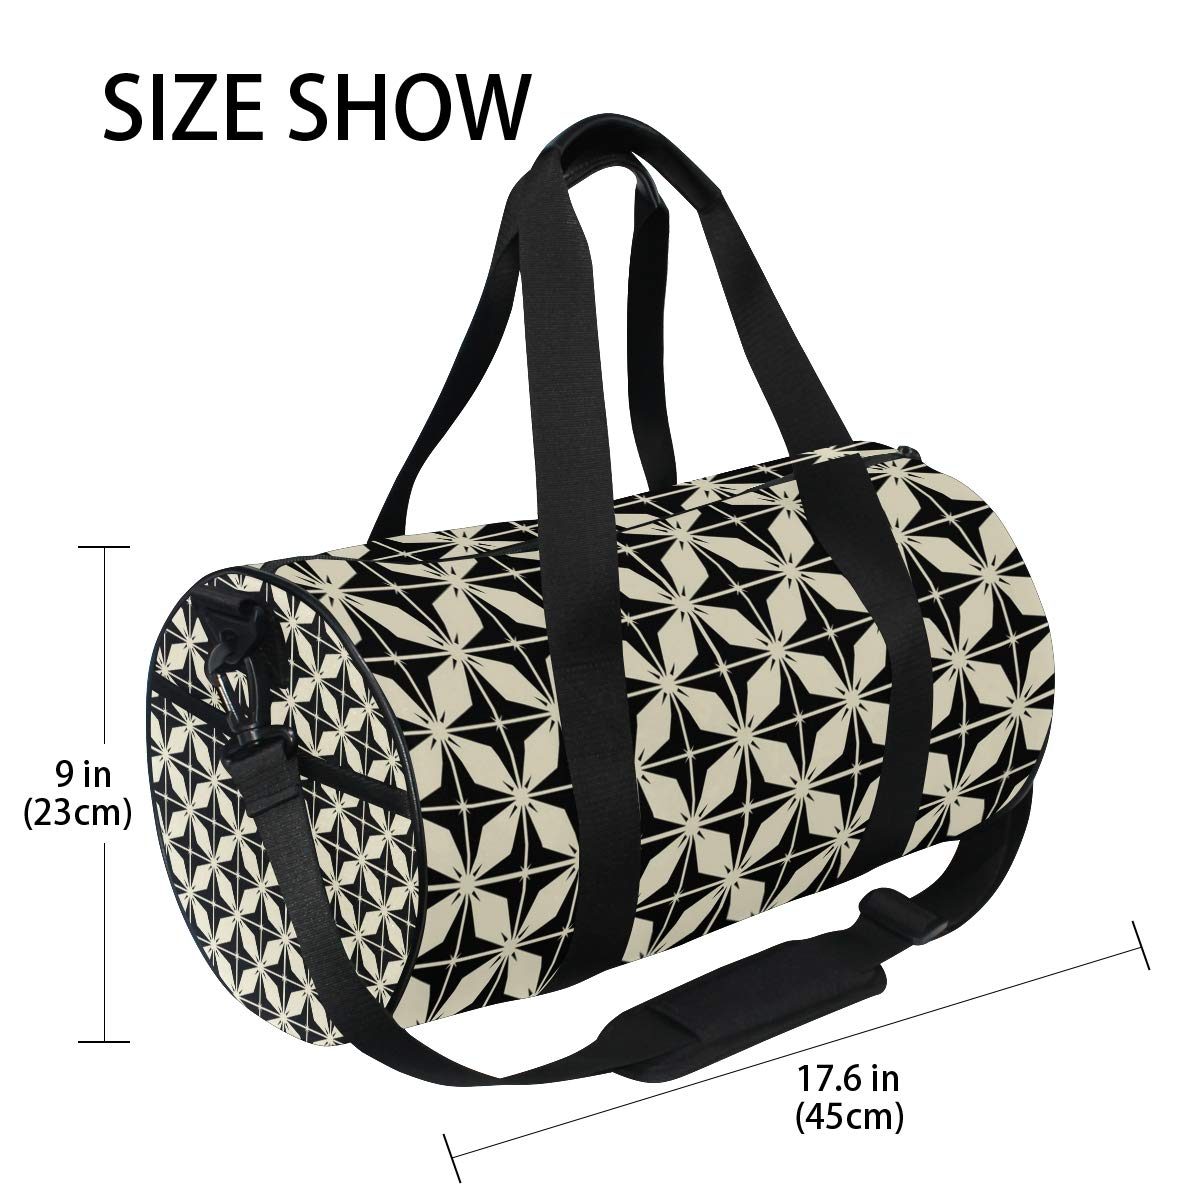 Lattice Silent Ceramic PictureWaterproof Non-Slip Wearable Crossbody Bag fitness bag Shoulder Bag